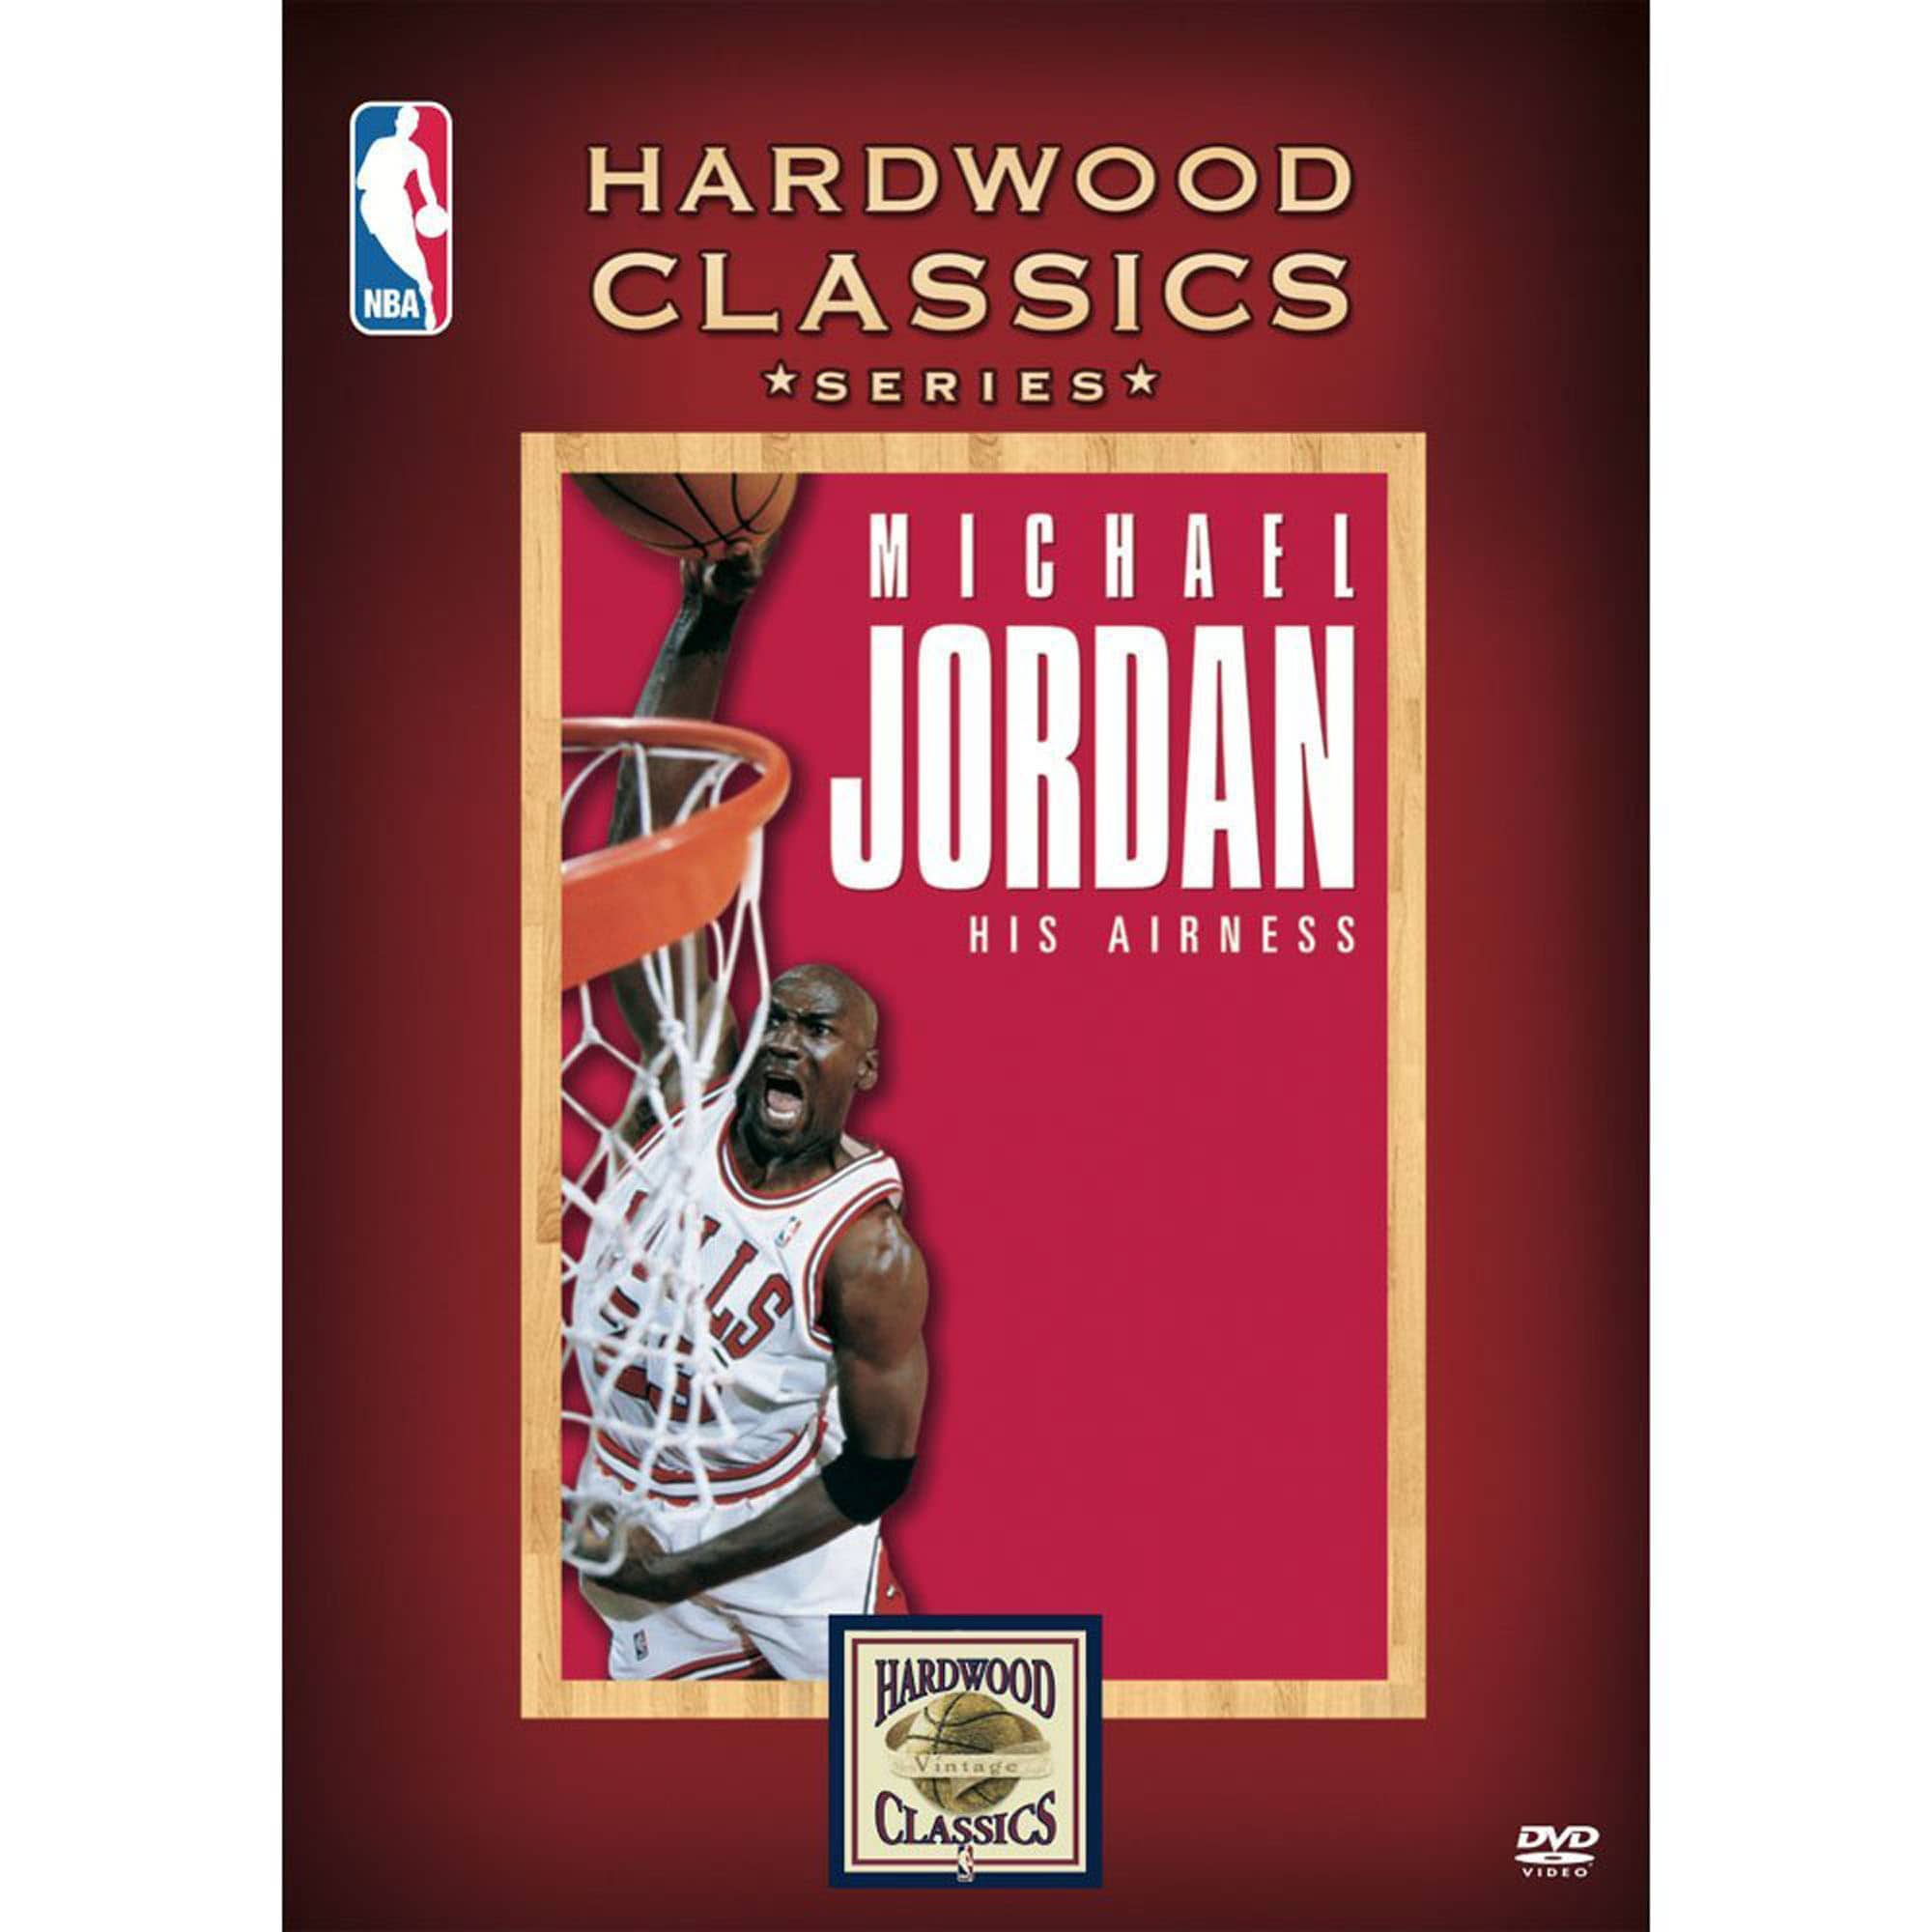 Michael Jordan Chicago Bulls Hardwood Classics: Michael Jordan His Airness DVD